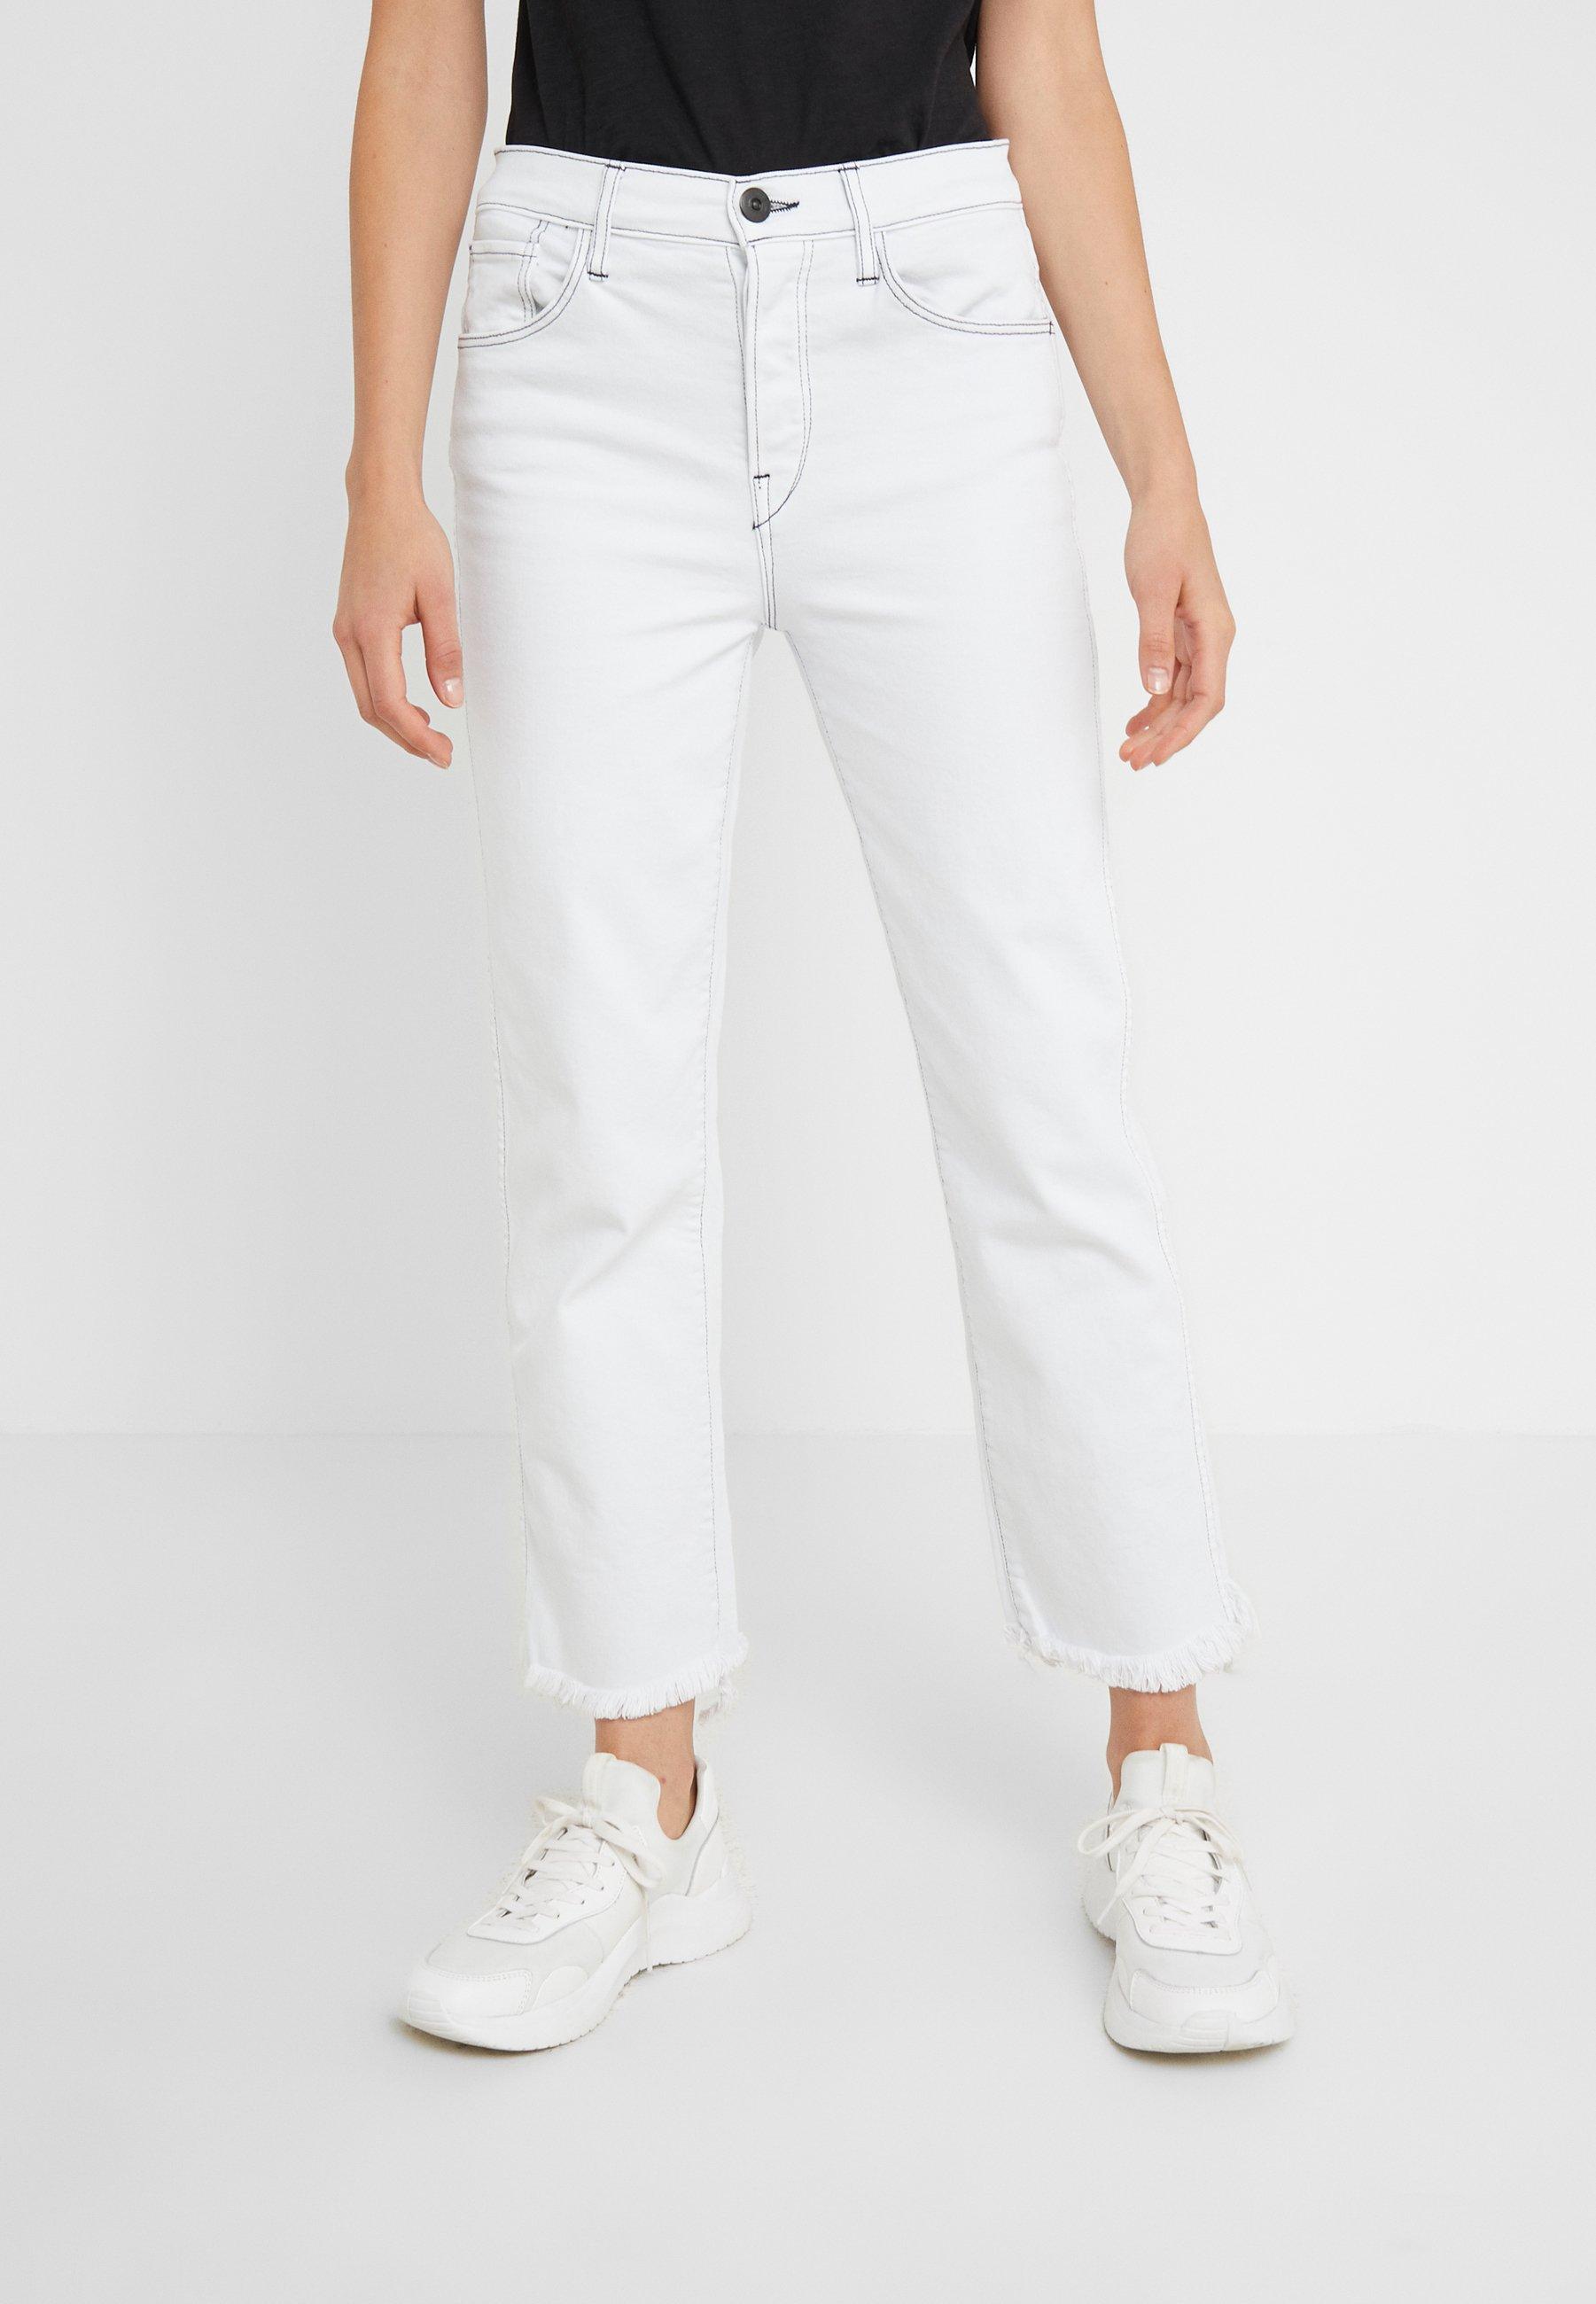 3x1 AUSTIN CROP - Jeans baggy adelia